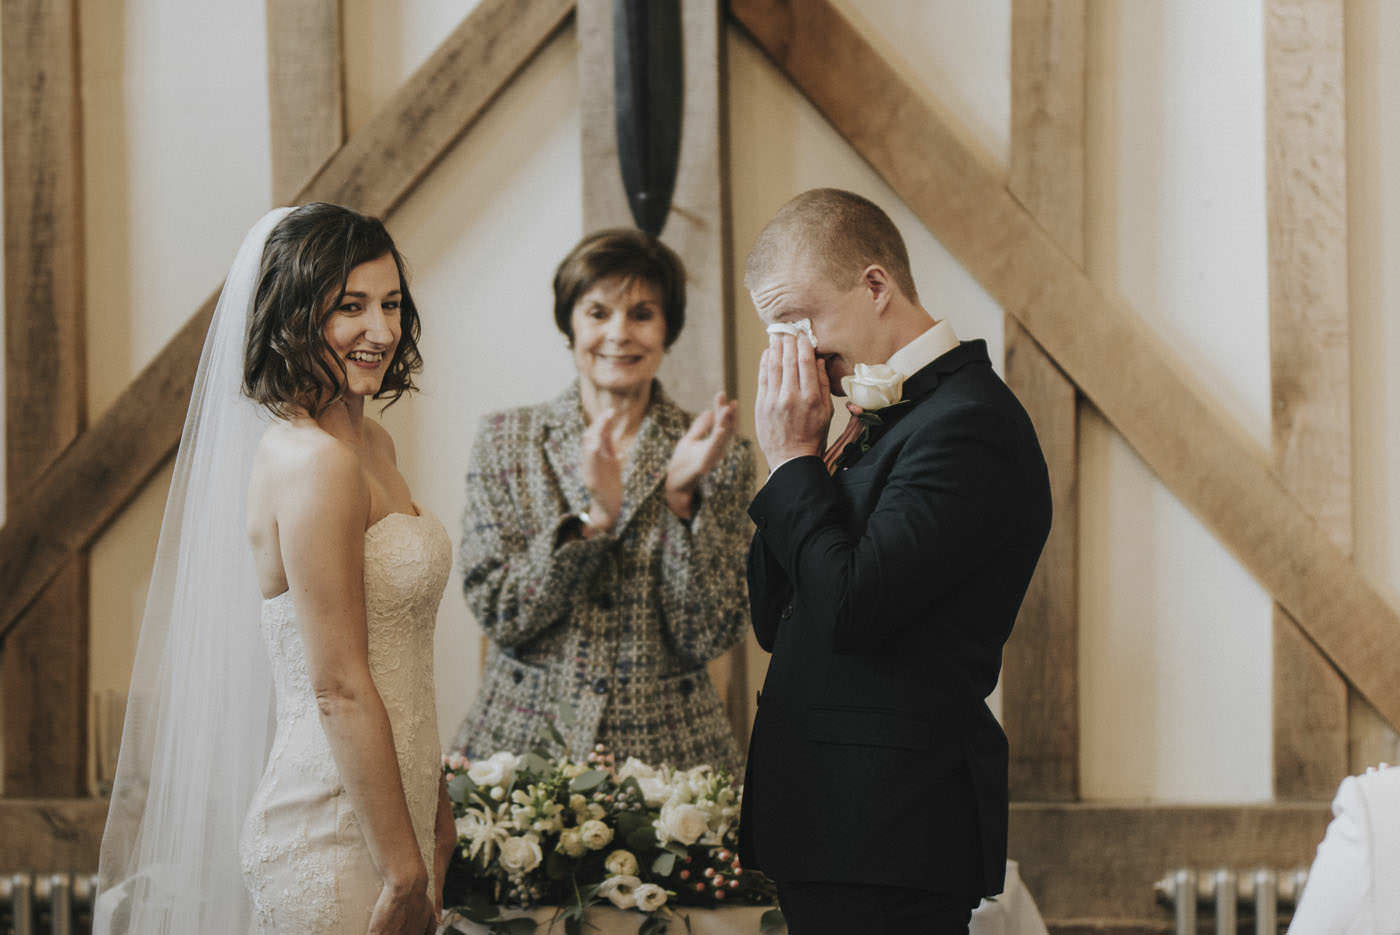 adamzoe gate street barn wedding photographer 0050